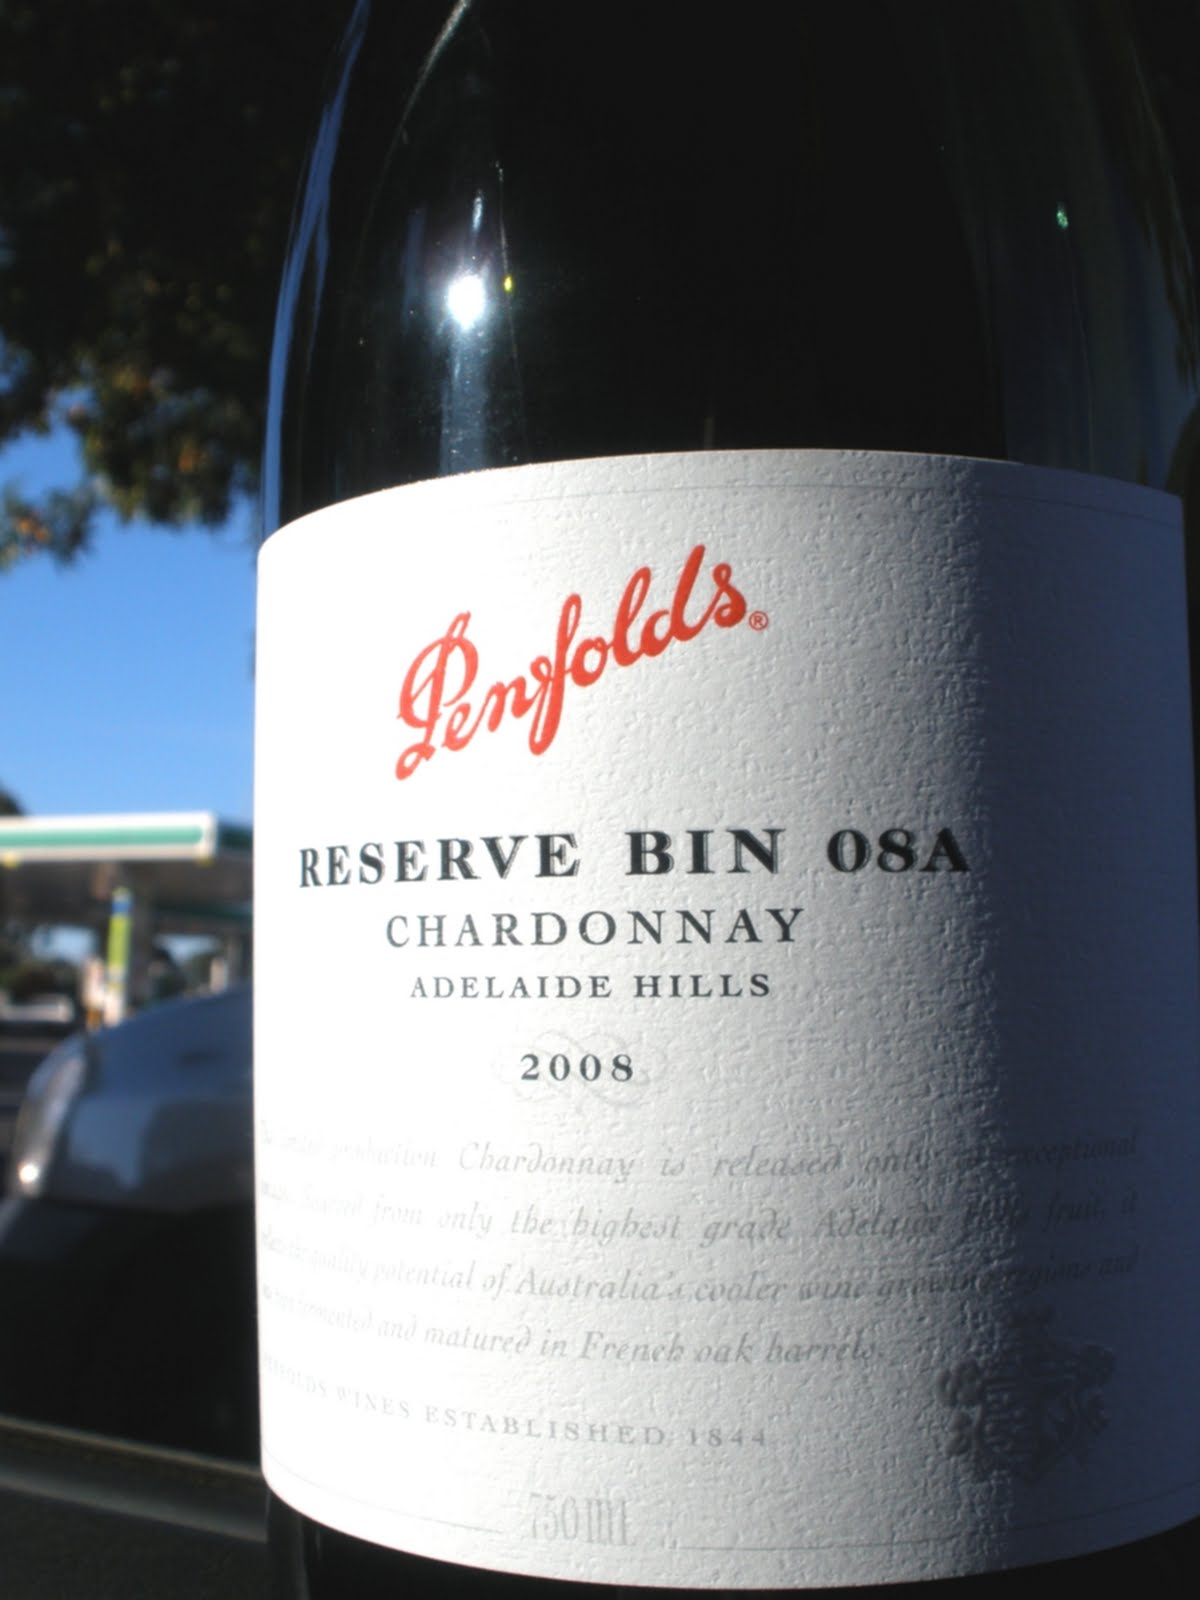 Bin08A Penfolds Chardonnay